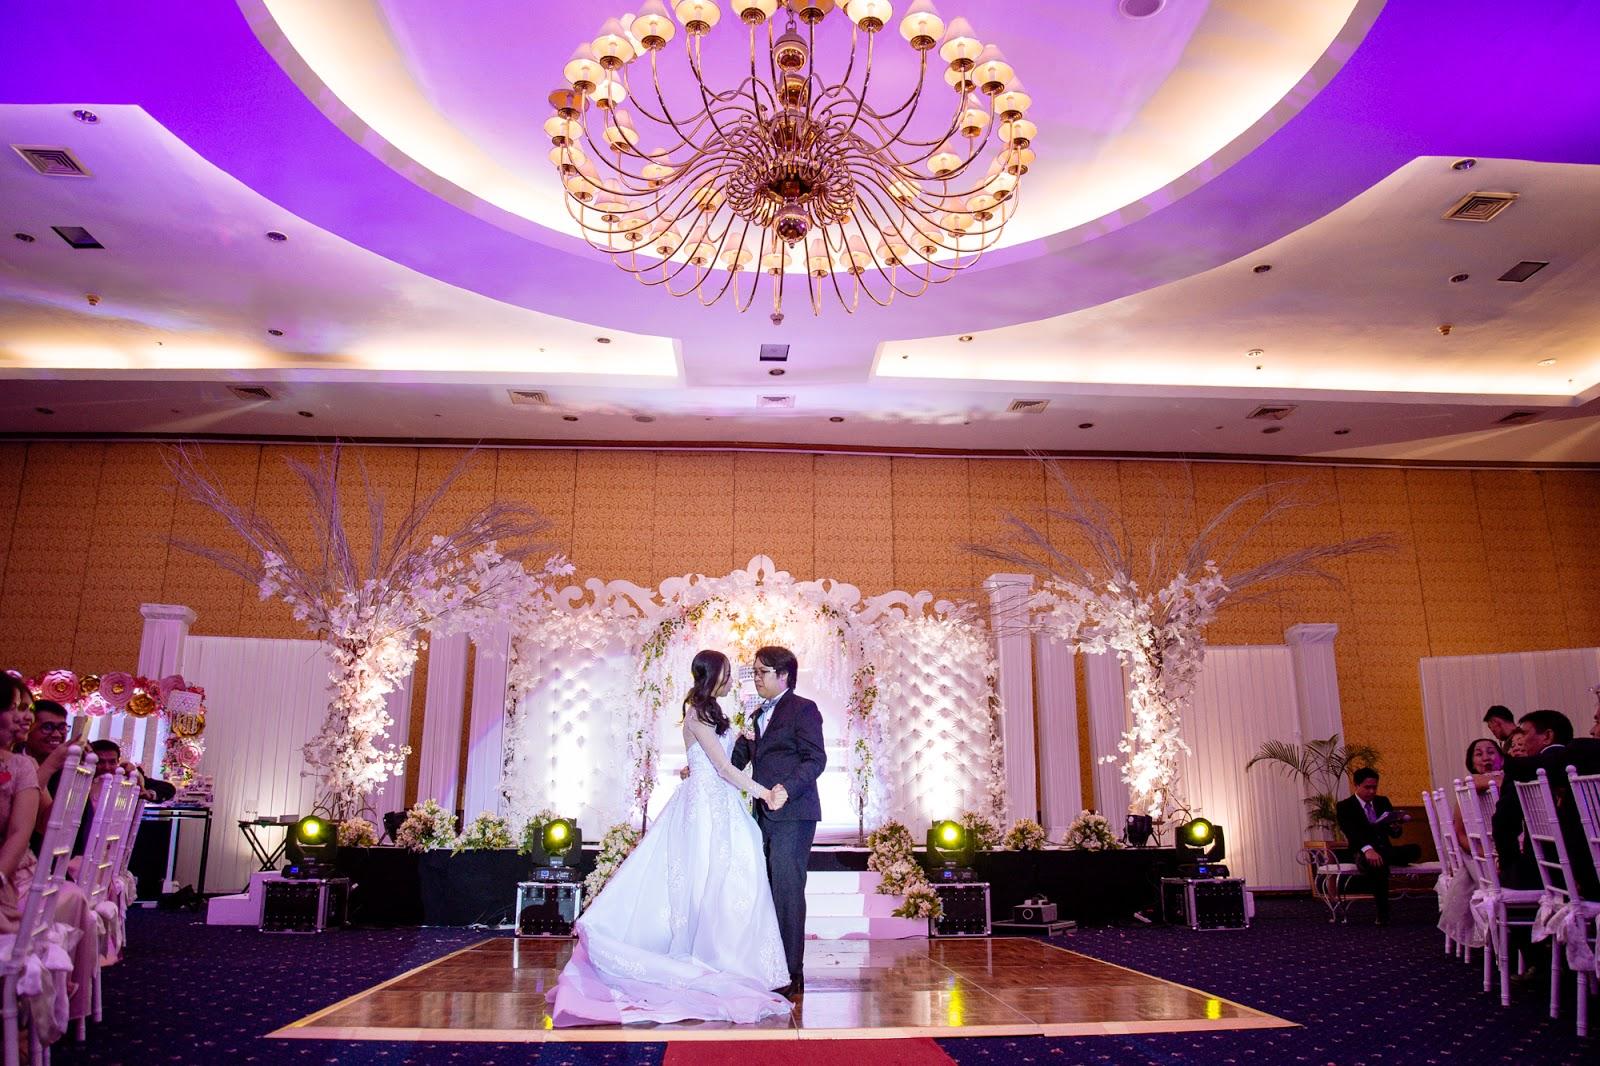 magical wedding reception